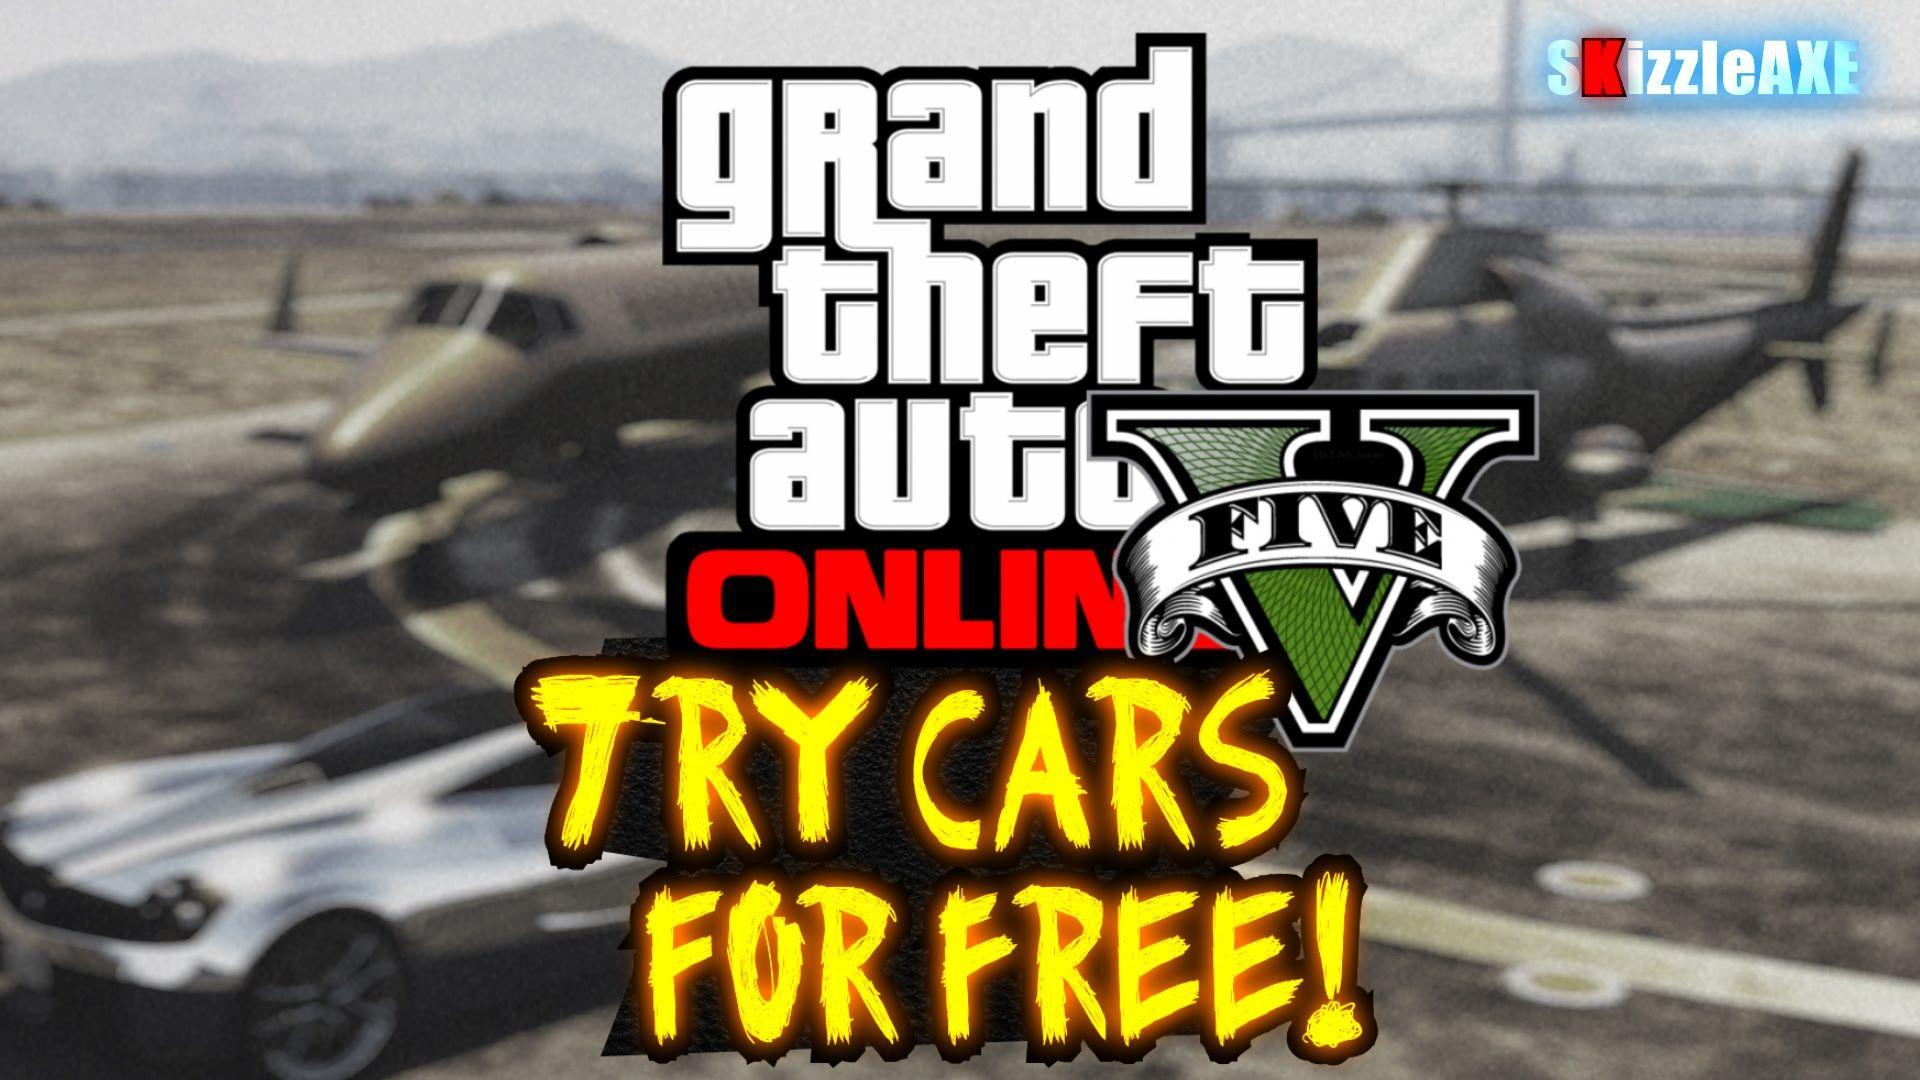 Gta 5 Online Try Dlc Cars For Free Pegassi Osiris Gta Online Ill Gotten Gains Dlc Update Gta V Gta Online Gta 5 Online Gta